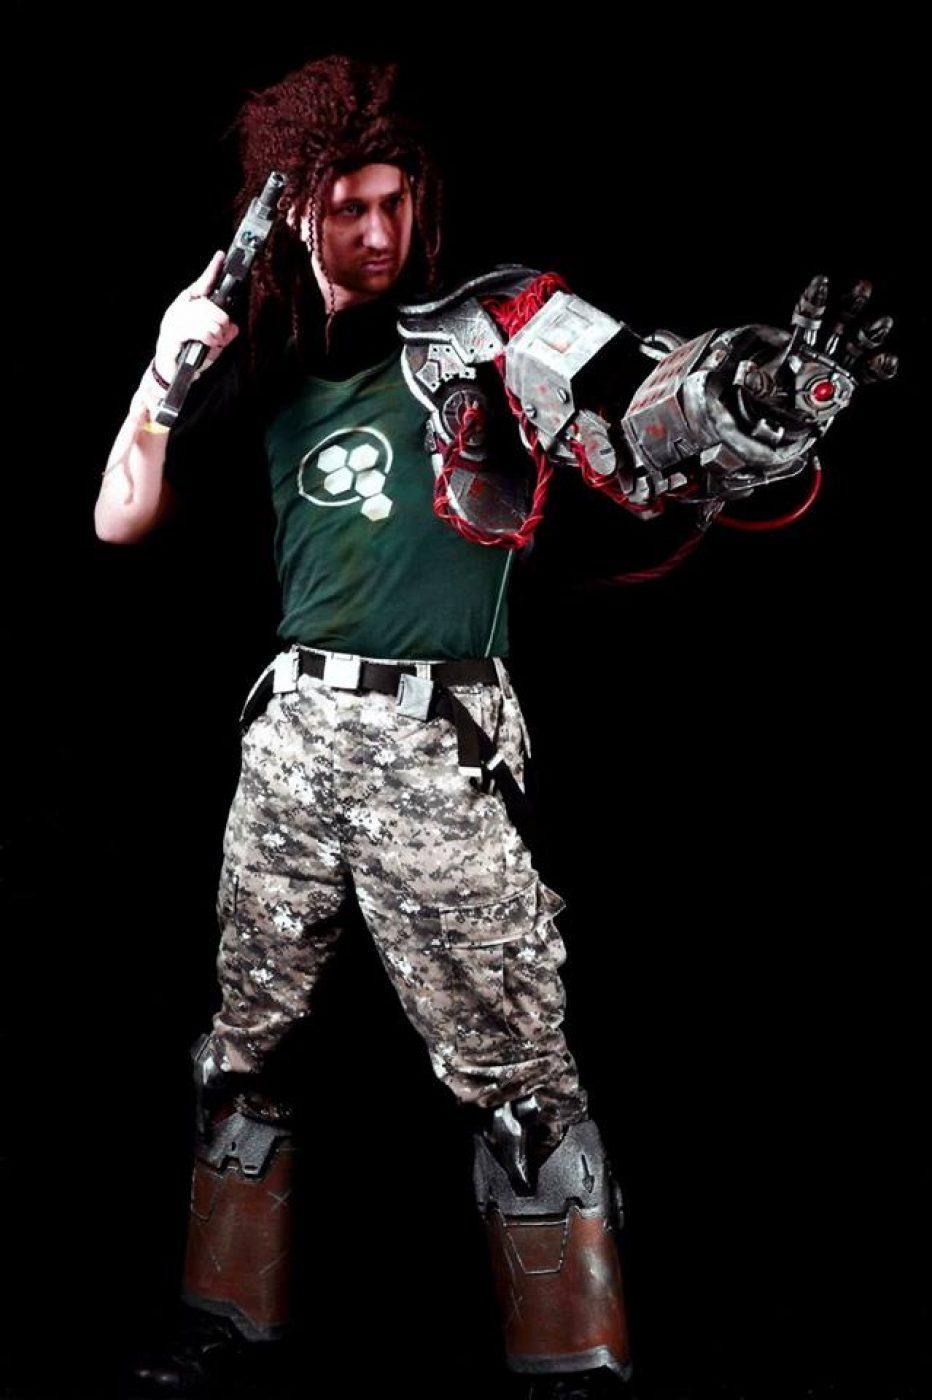 Bionic-Commando-Nathan-Spencer-Cosplay-Gamers-Heroes-2.jpg